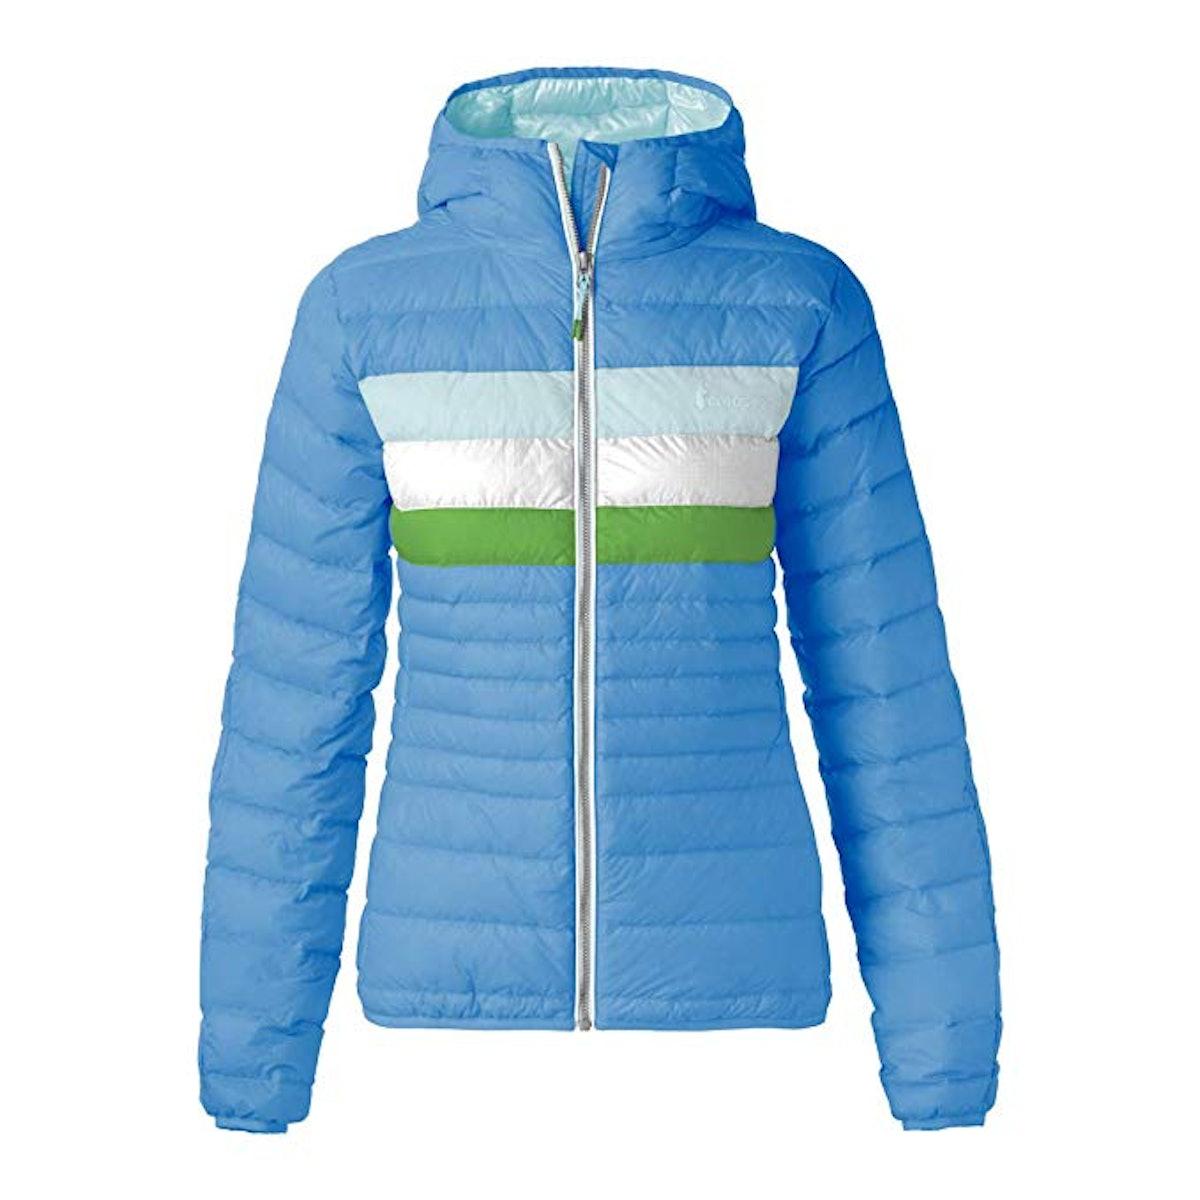 Cotopaxi Fuego Hooded Jacket